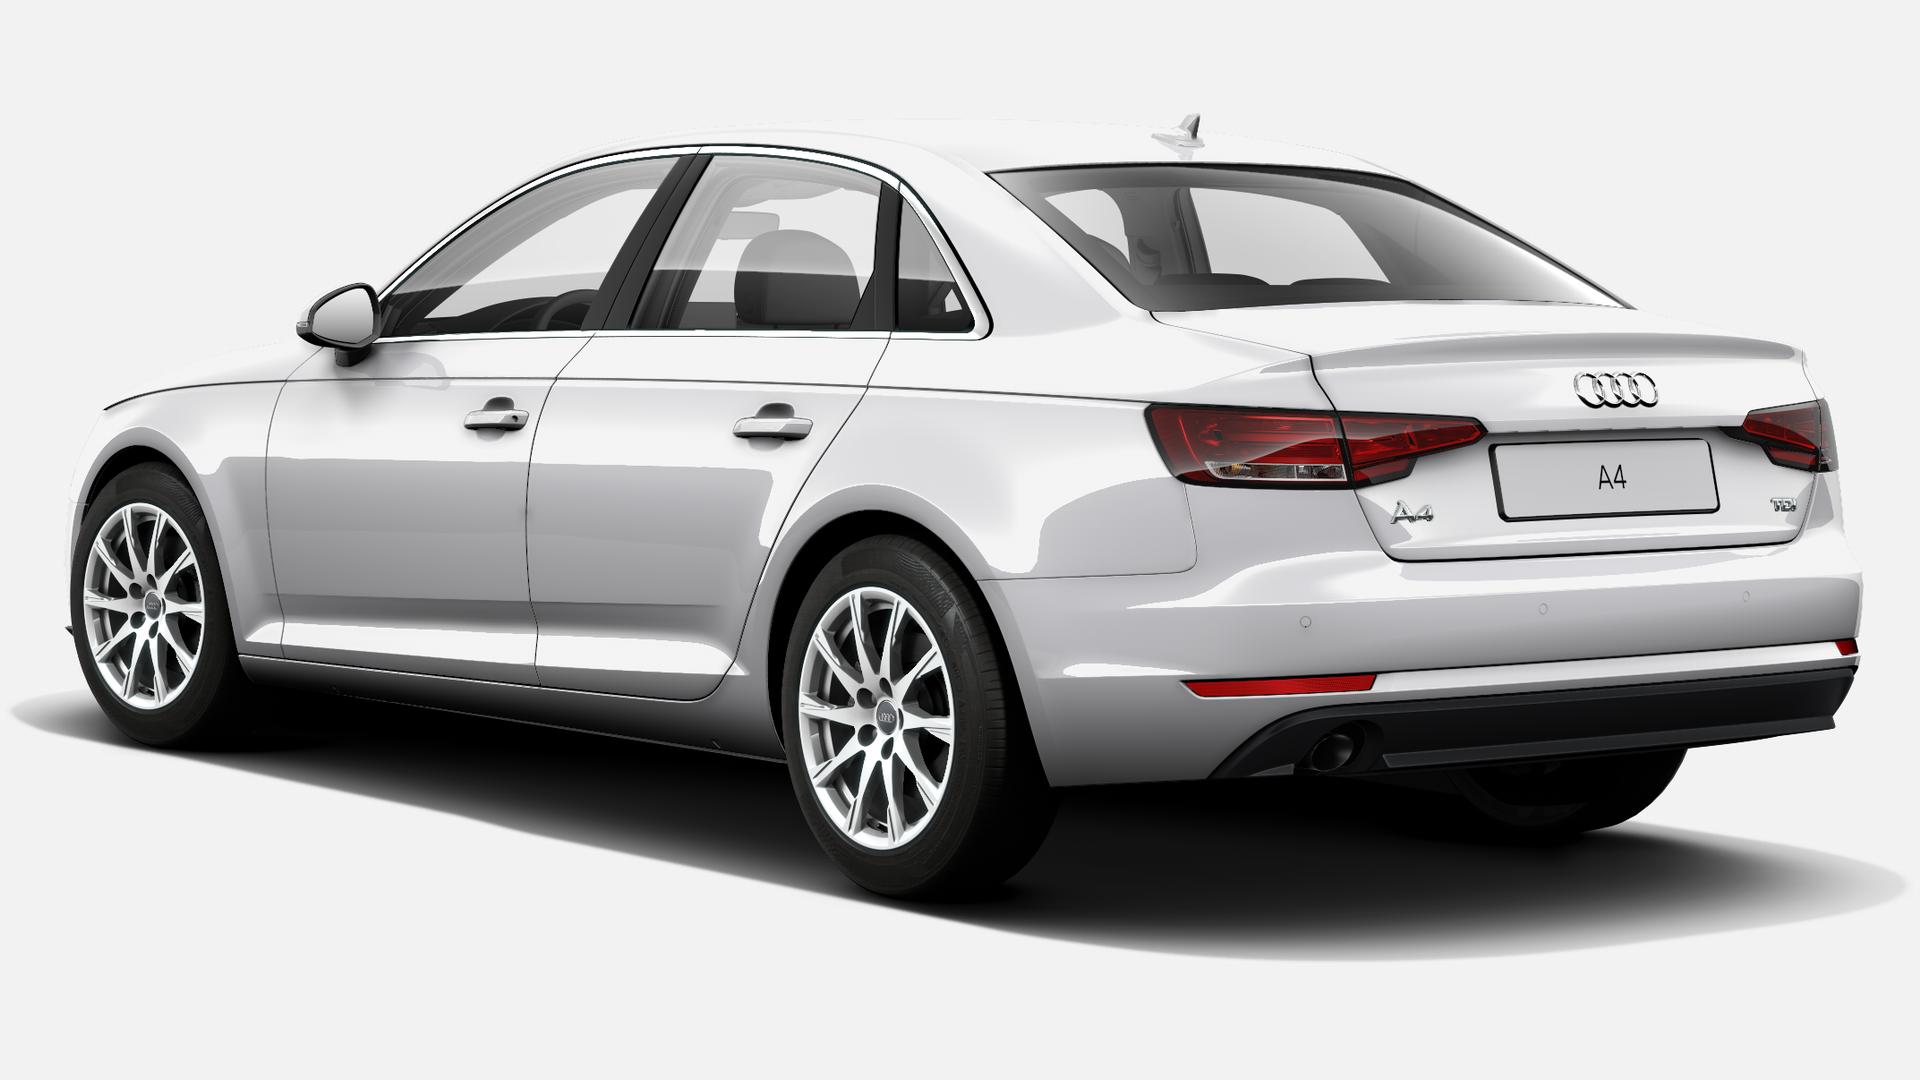 Vista Tres cuartos trasera izquierda de Audi A4 2.0 TDI ultra Advanced edition 110 kW (150 CV)